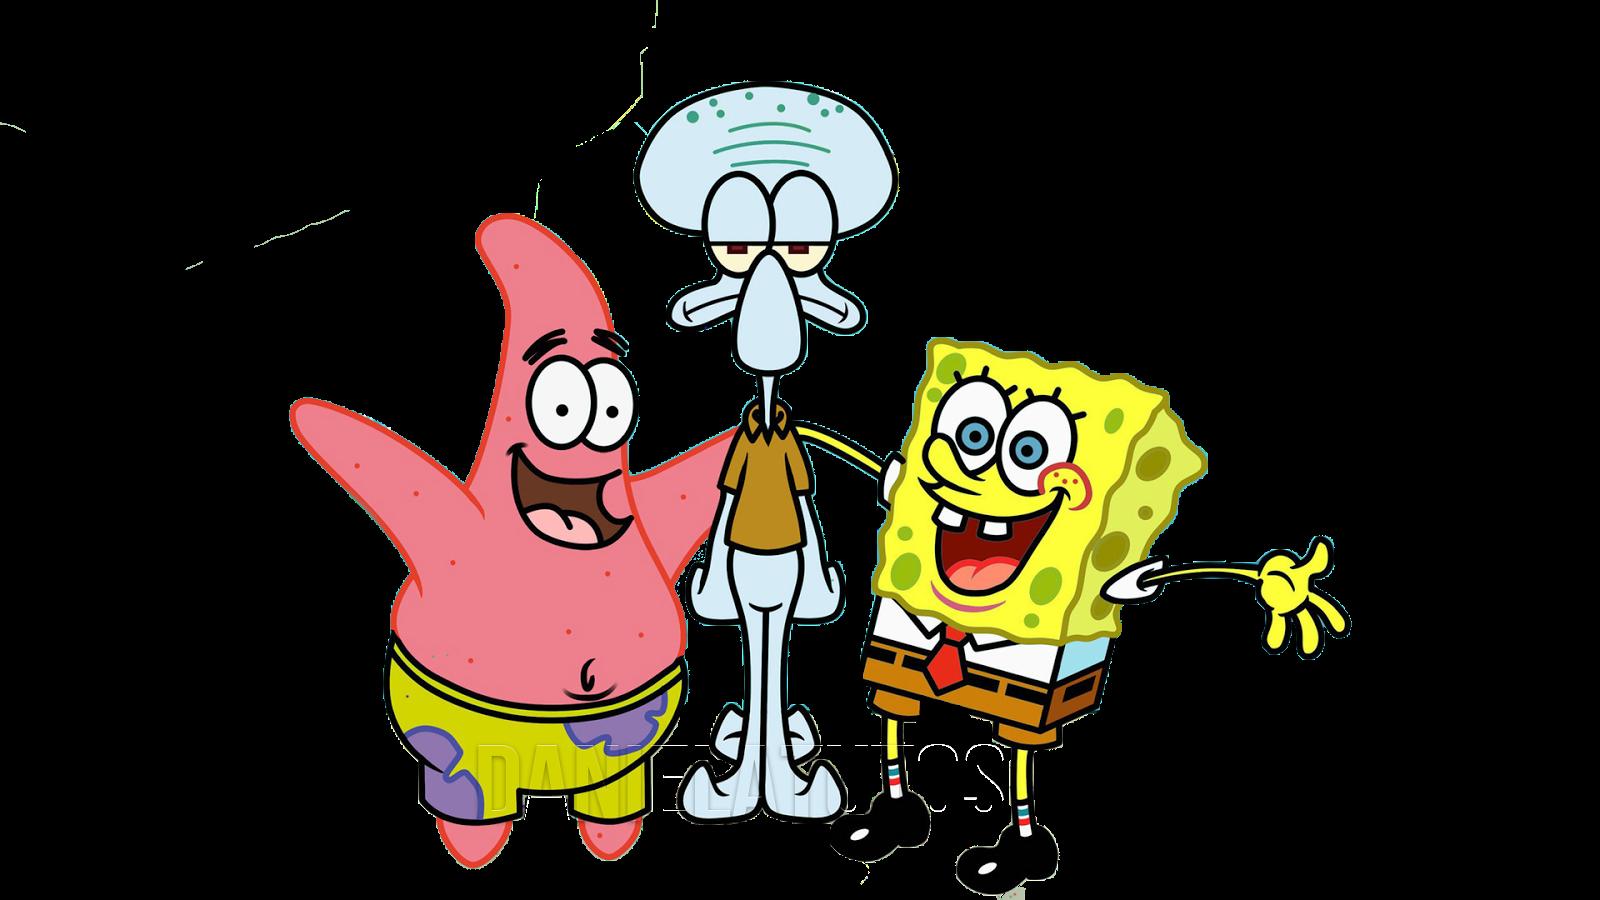 Spongebob Characters | www.imgkid.com - The Image Kid Has It!